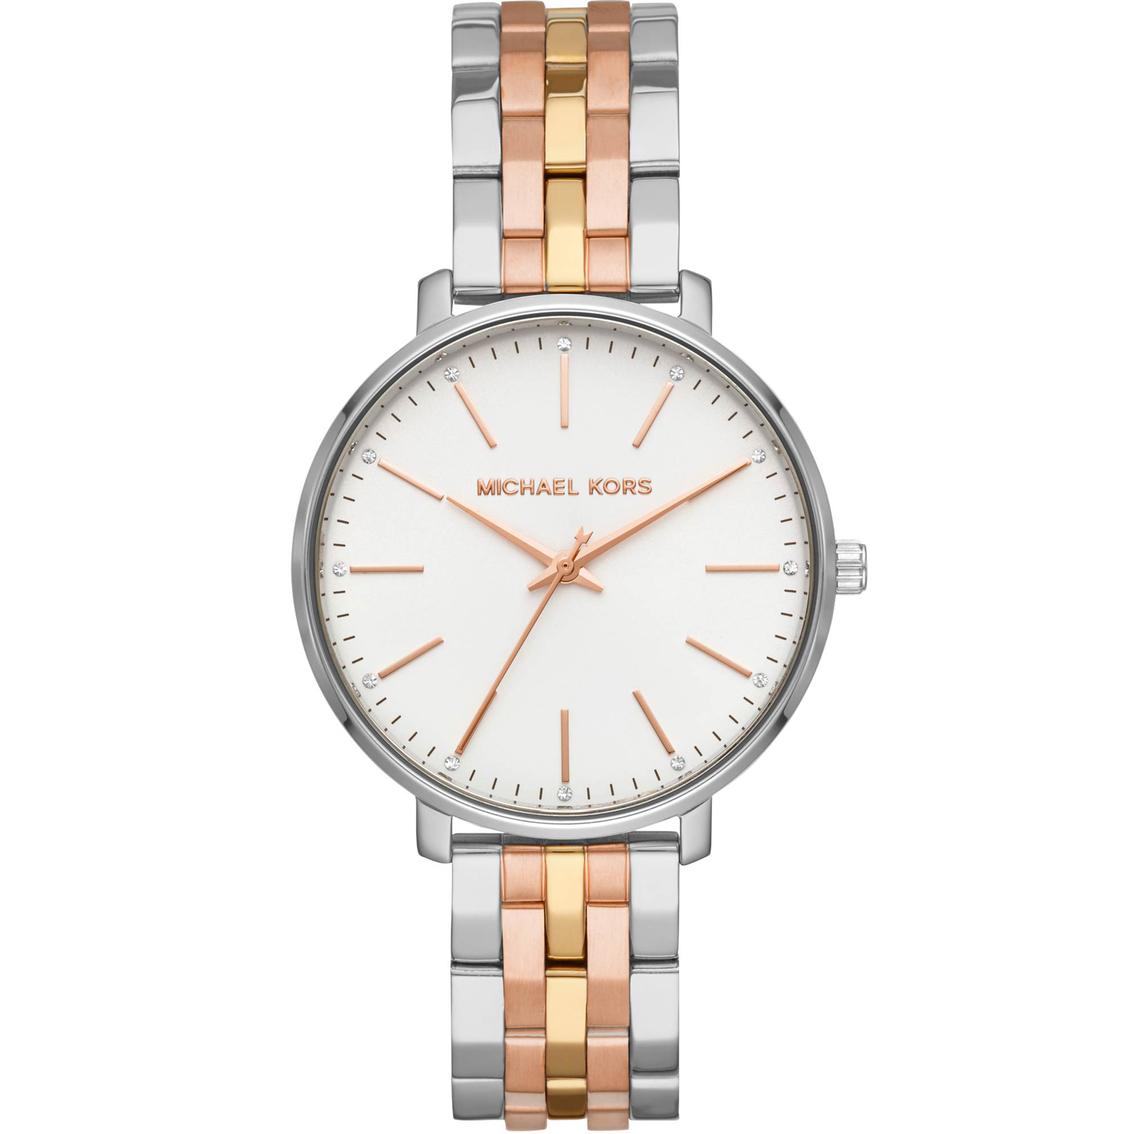 b4d073106a4c Michael Kors Women s Pyper 3 Hand Tri Tone Stainless Steel Watch MK3901